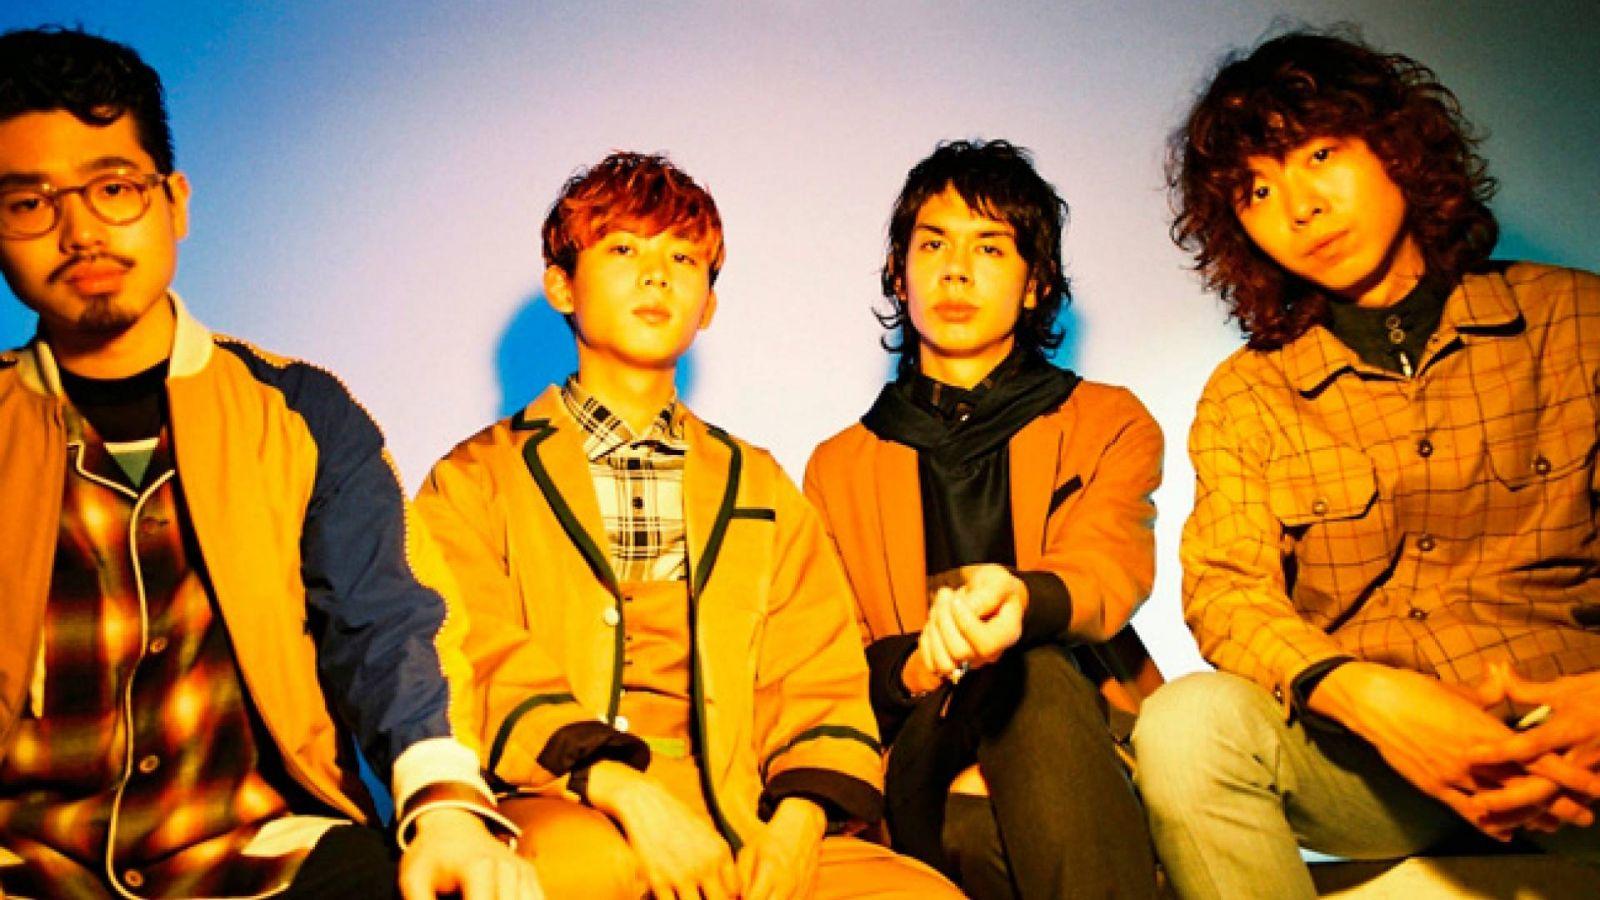 Седьмой альбом OKAMOTO`S © Sony Music Artists Inc. All rights reserved.